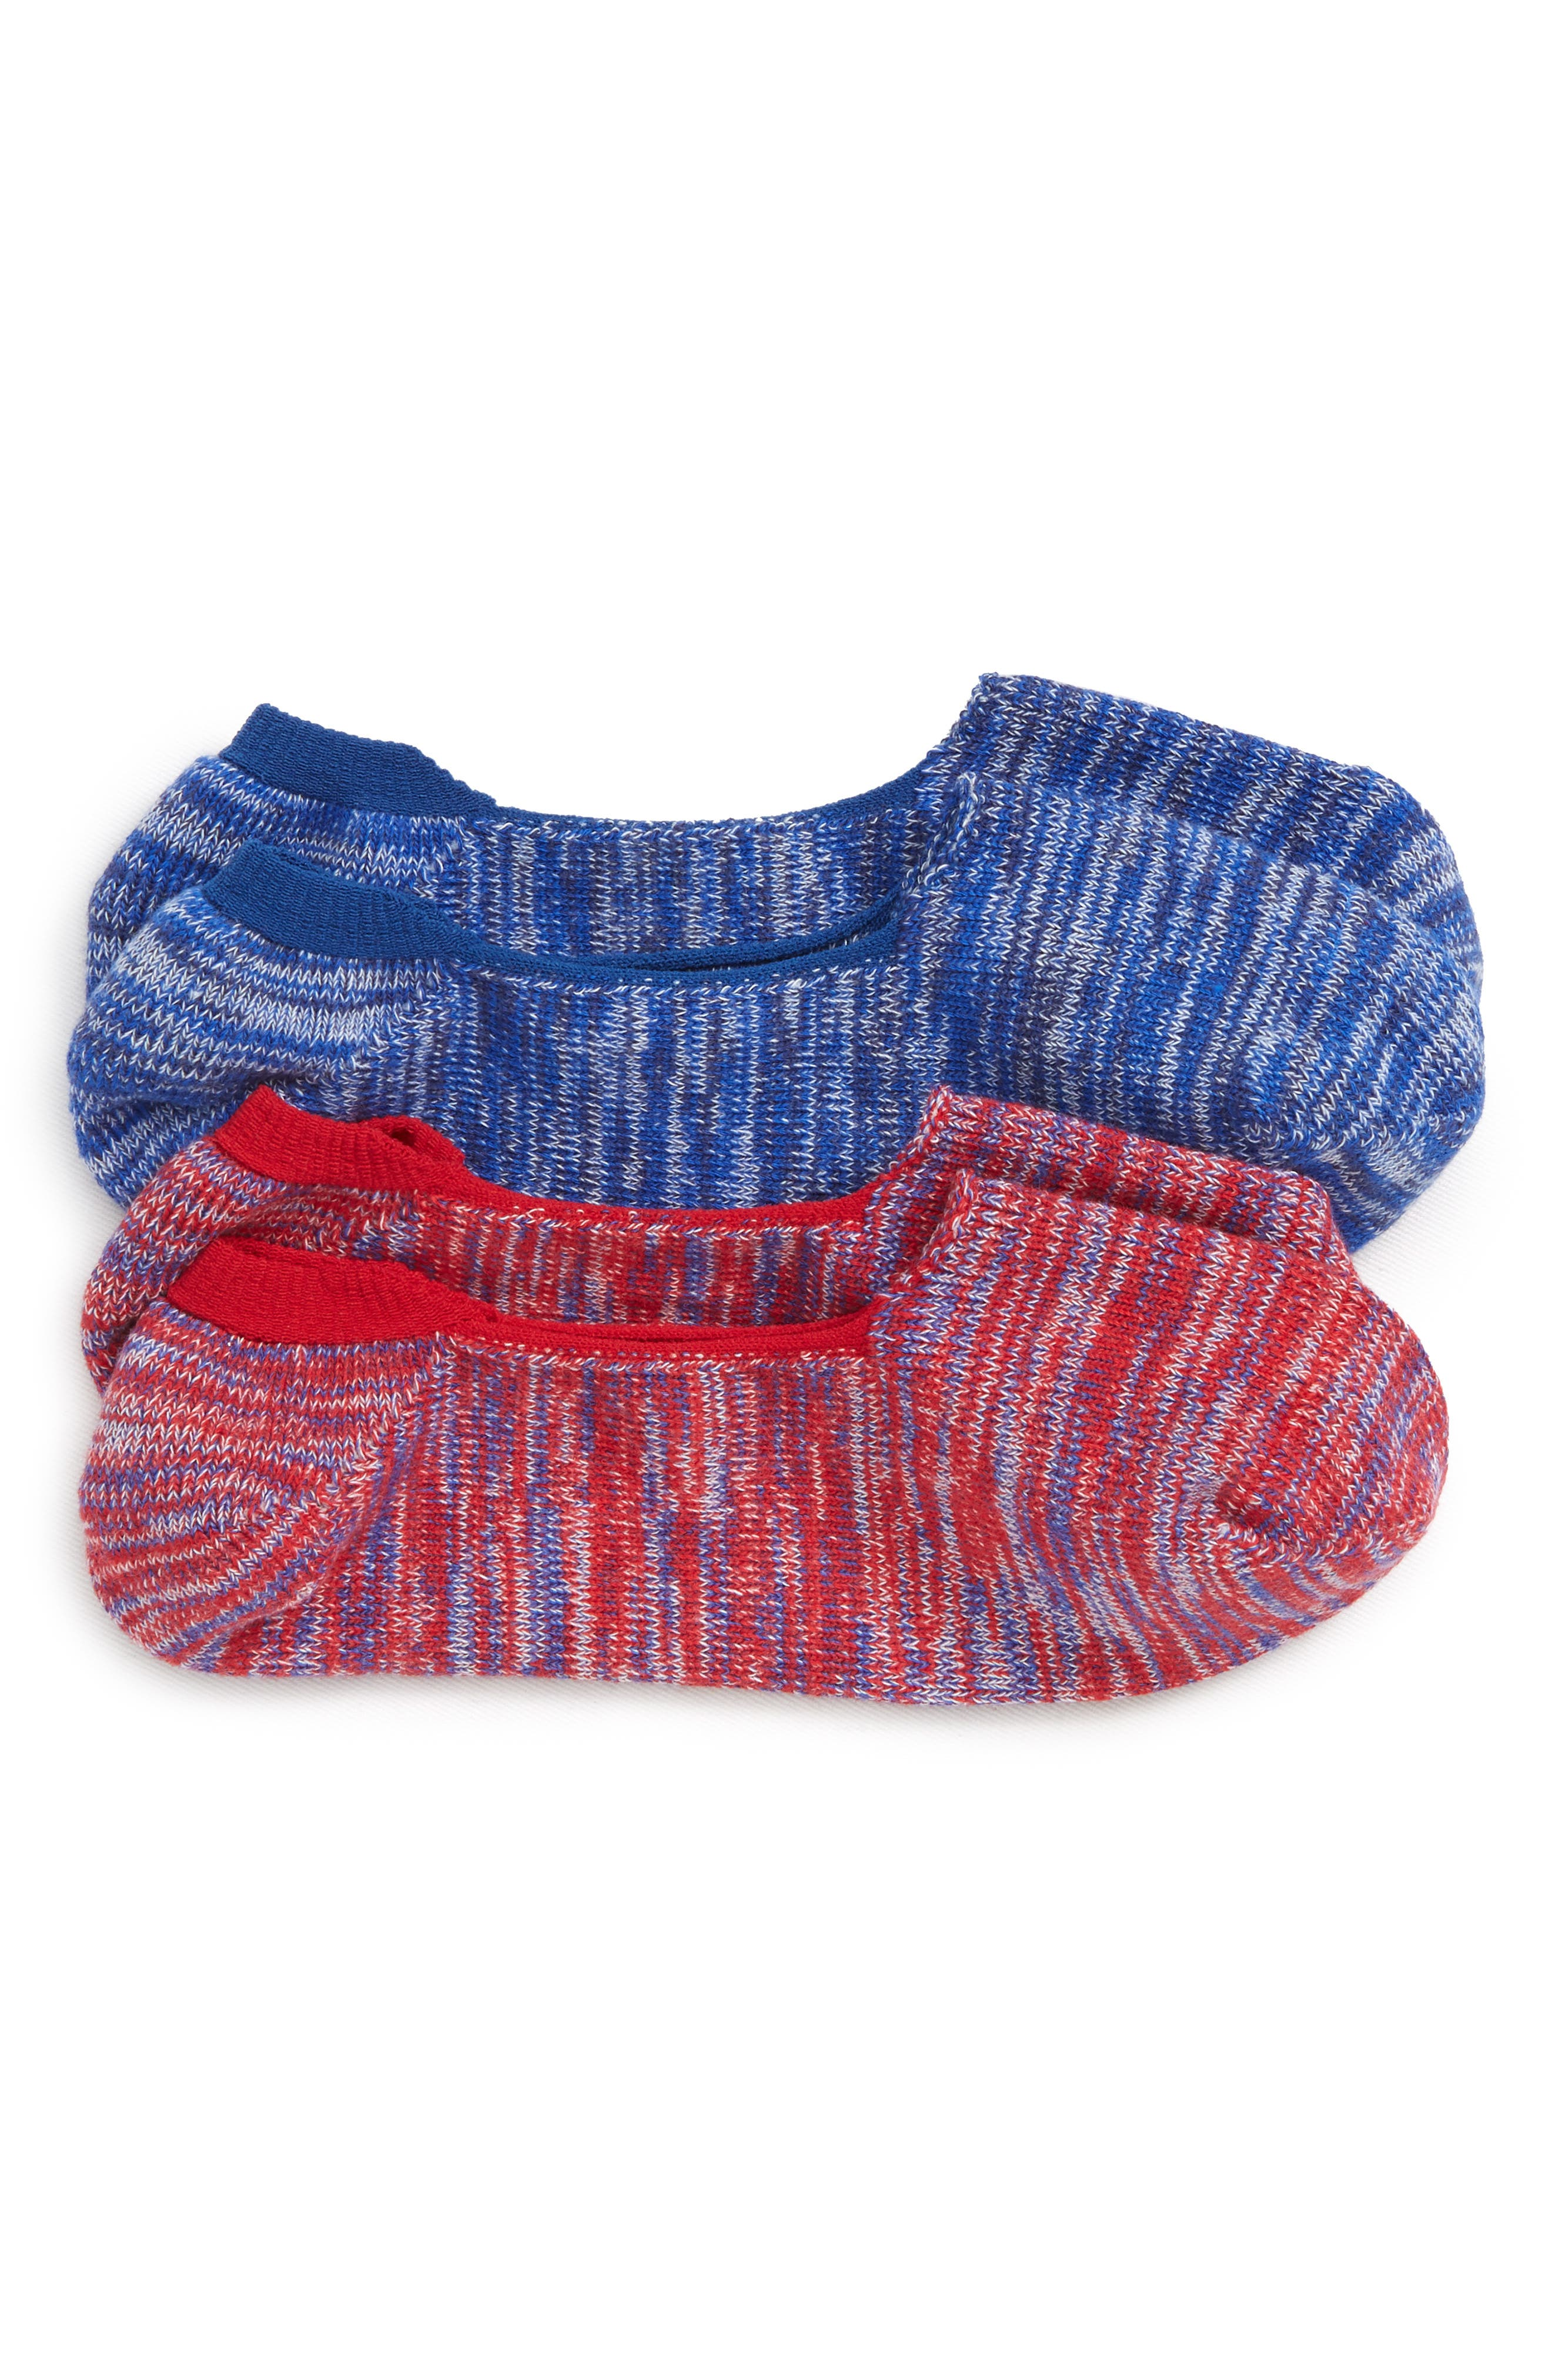 2-Pack Marl Loafer Liner Socks,                             Main thumbnail 1, color,                             RED MARL/ NAVY MARL